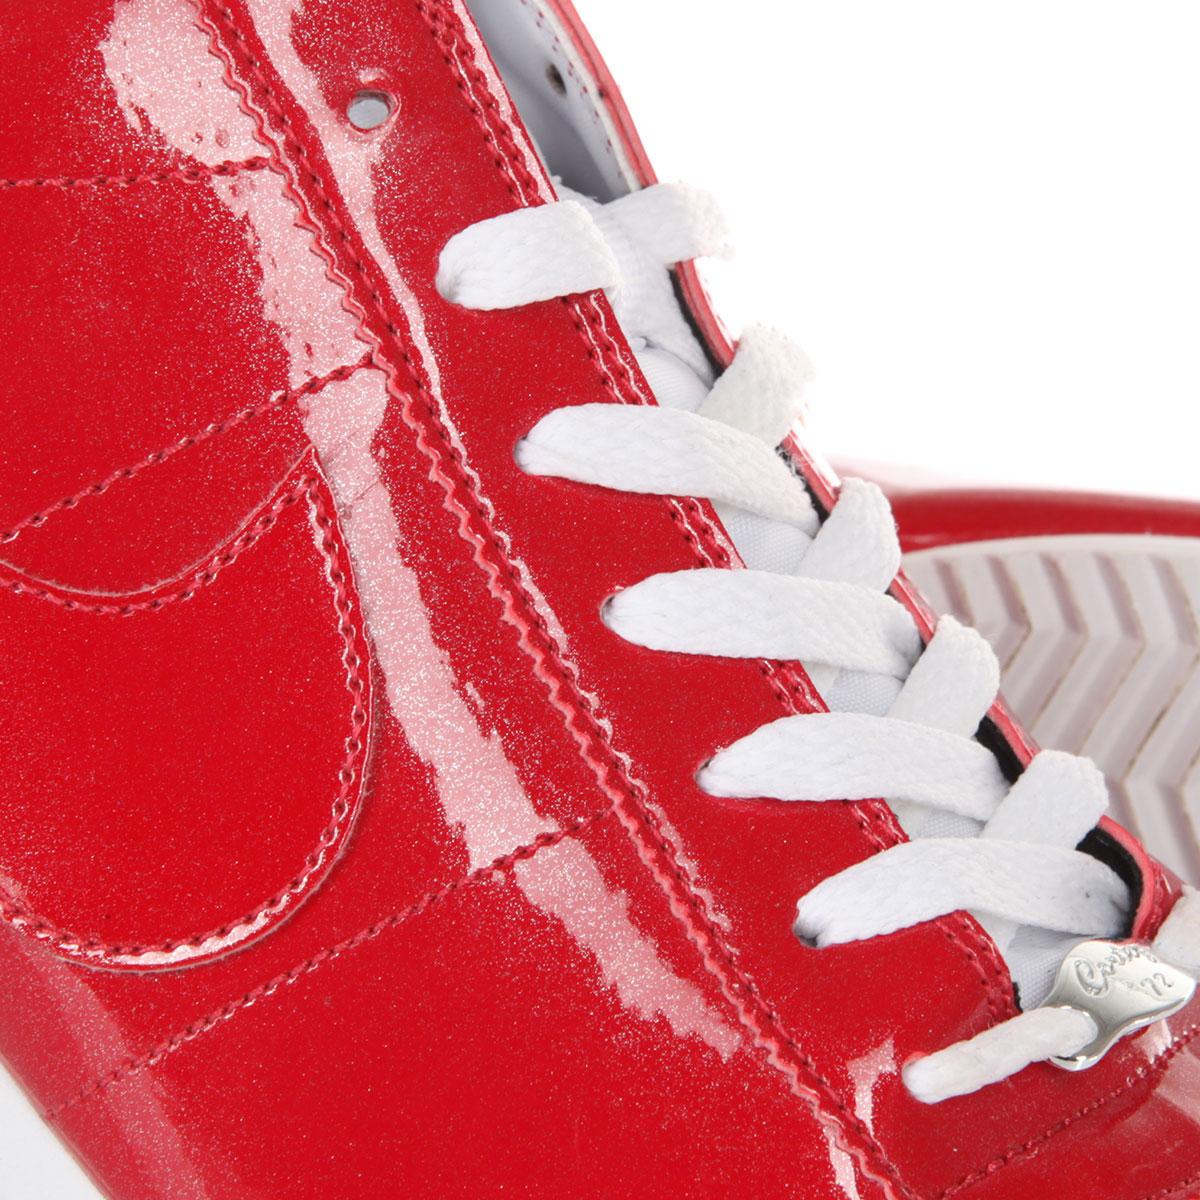 c950484303c0 Купить кроссовки Nike Cortez 72 Premium Patent Gym Red White в ...